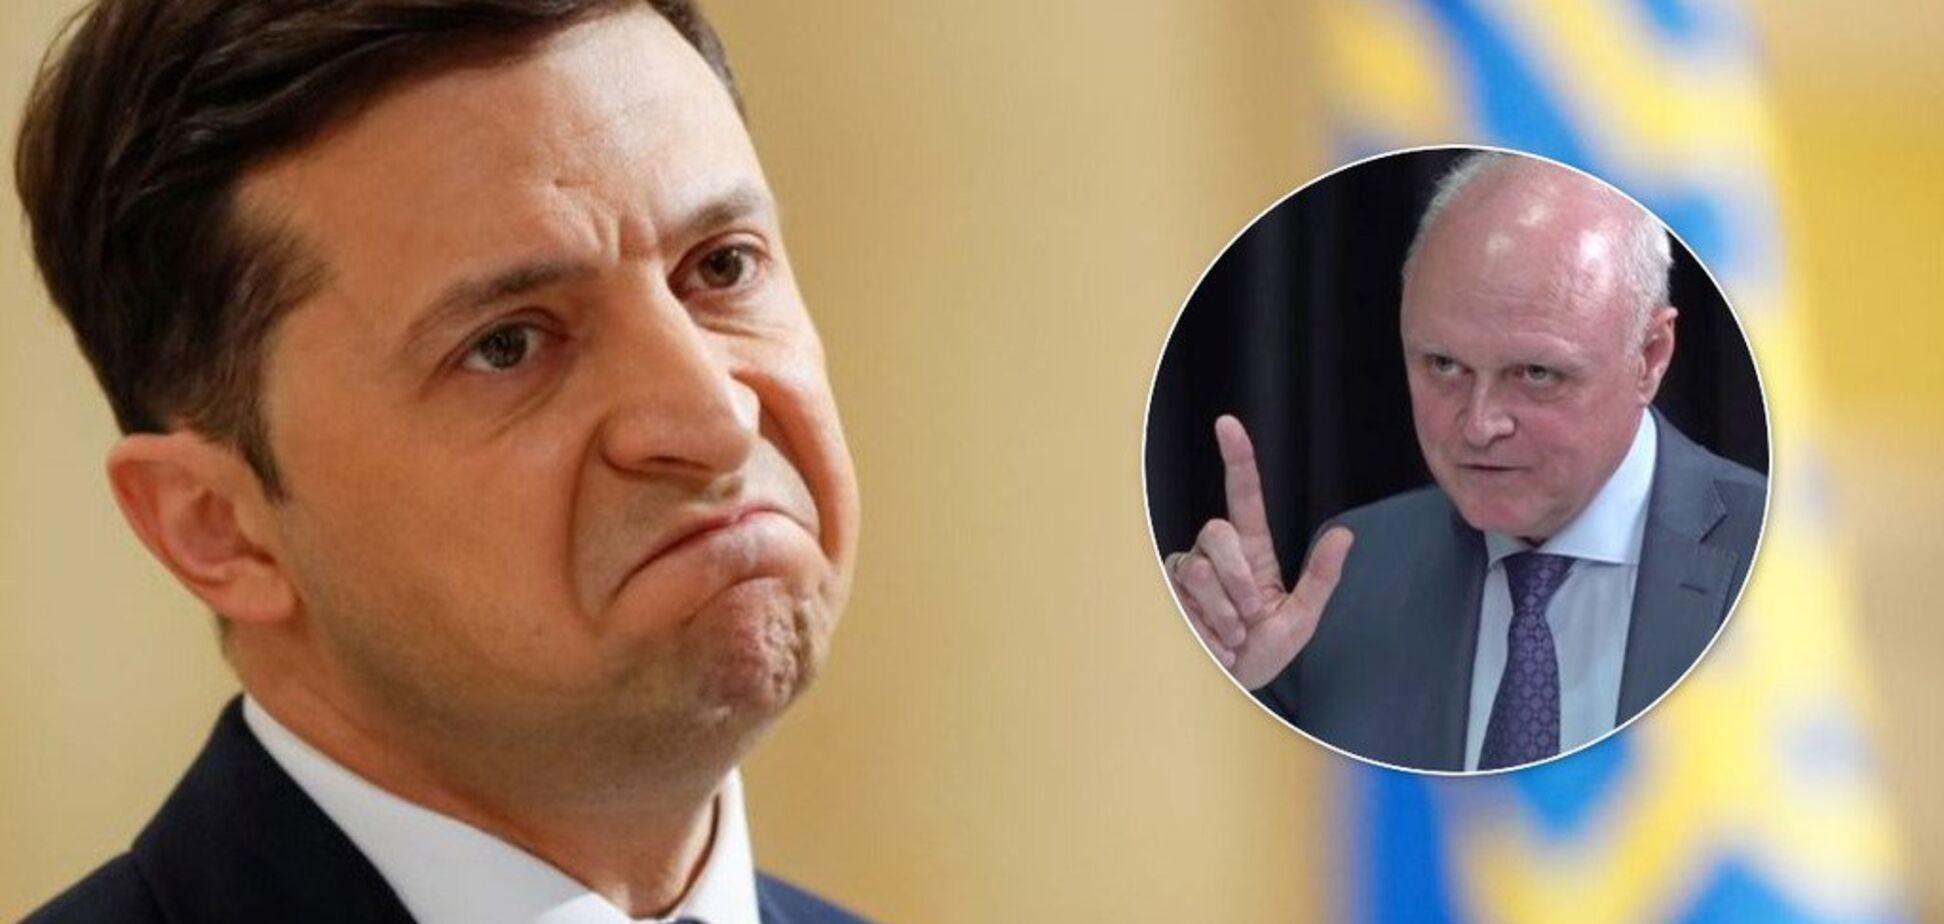 Гриценко предупредил об атаке Кремля на советника Зеленского